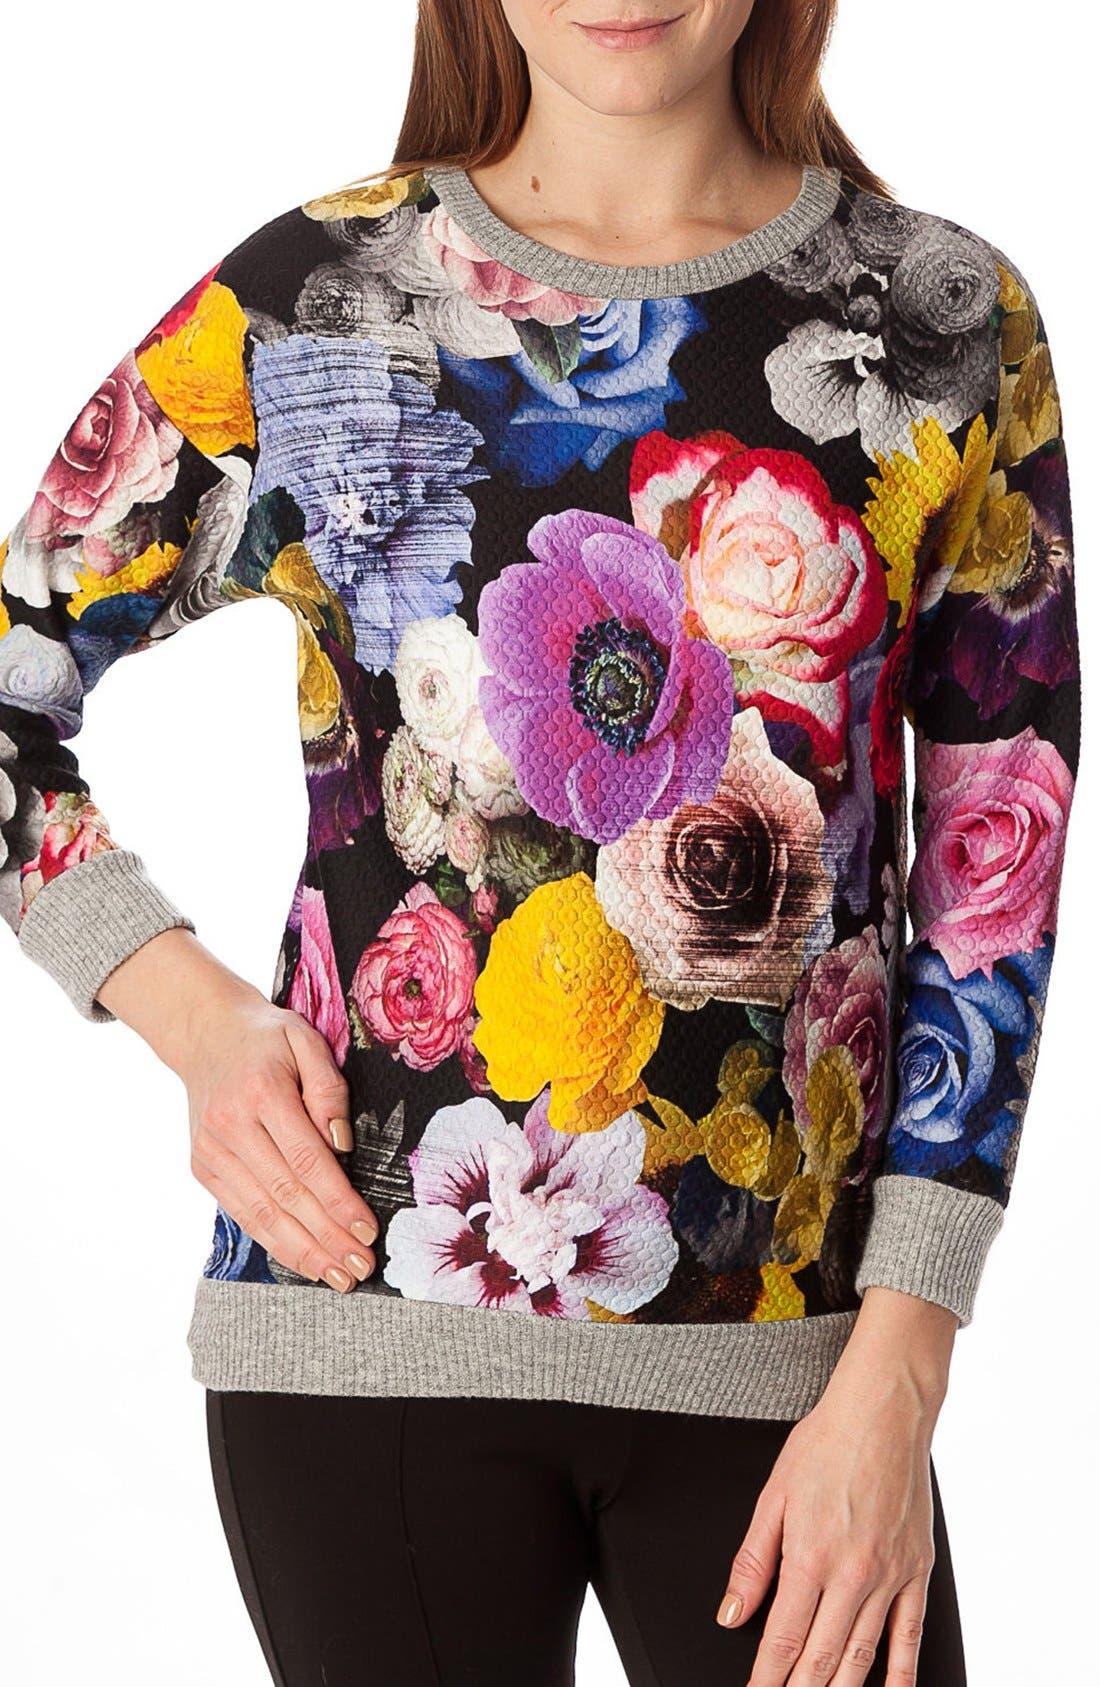 PIETRO BRUNELLI 'Ocean' Floral Print Quilted Maternity Sweatshirt